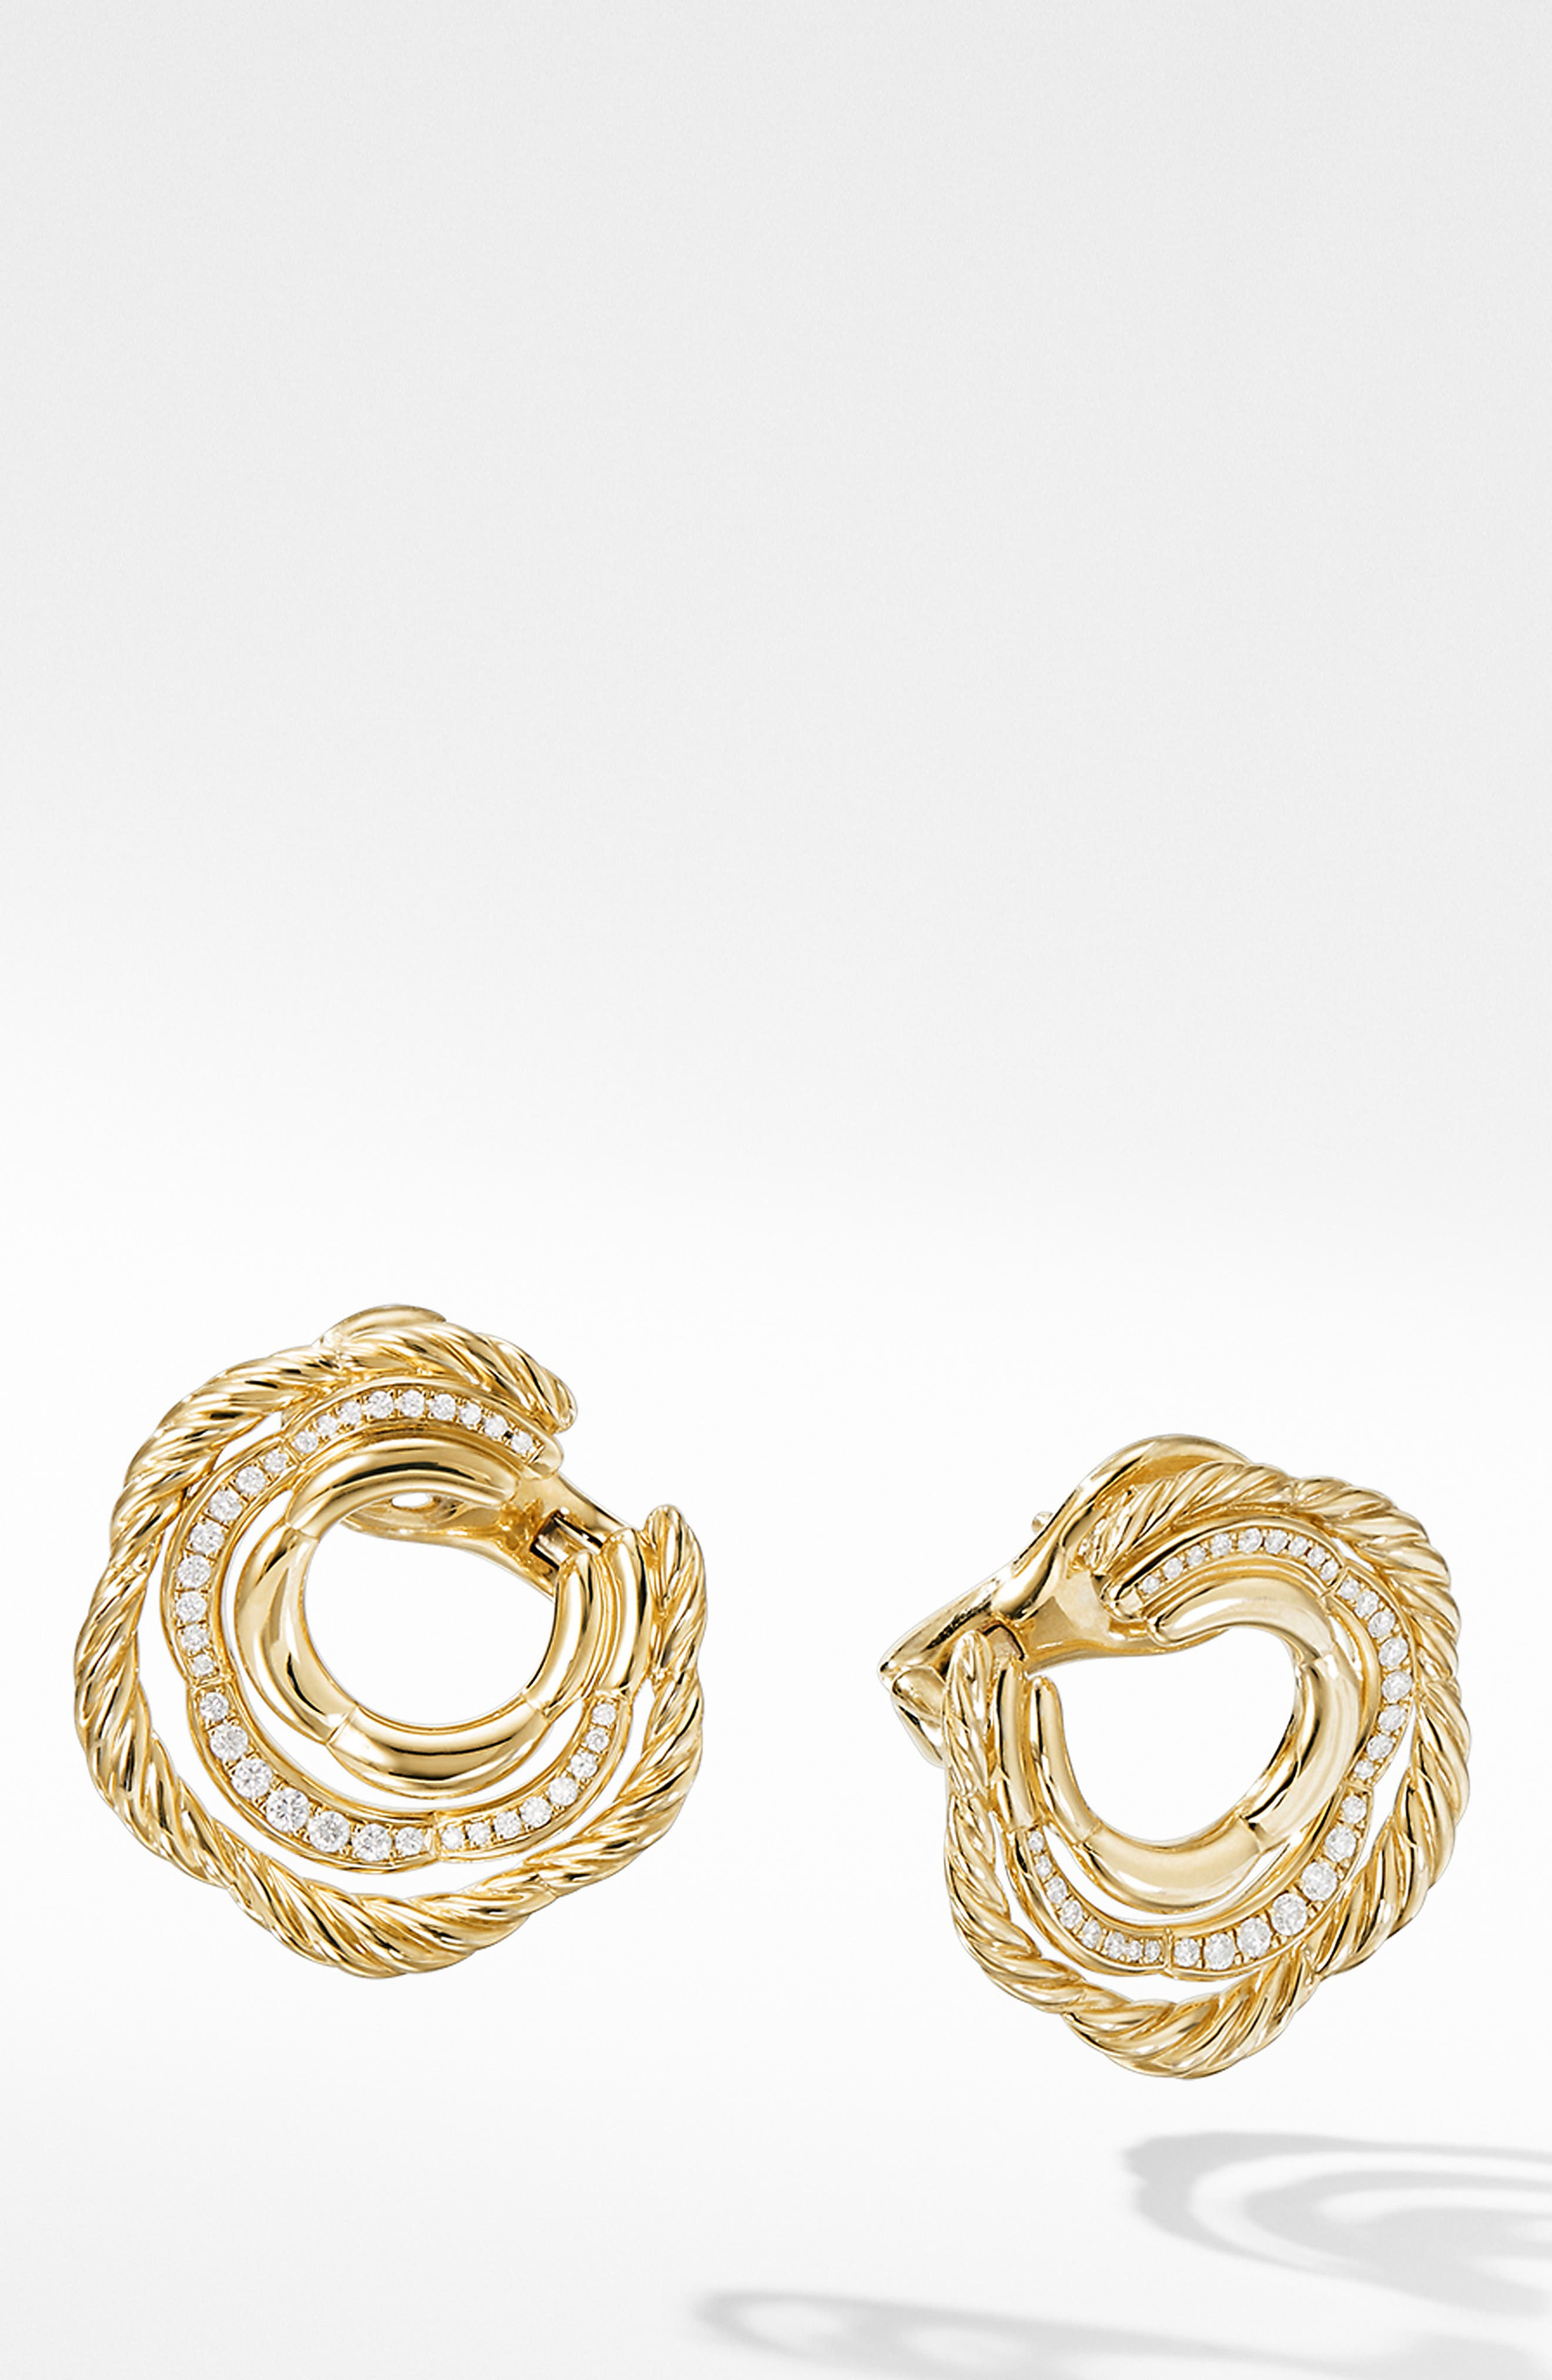 Tides Huggie Hoop Earrings with Pavé Diamonds,                         Main,                         color, GOLD/ DIAMOND